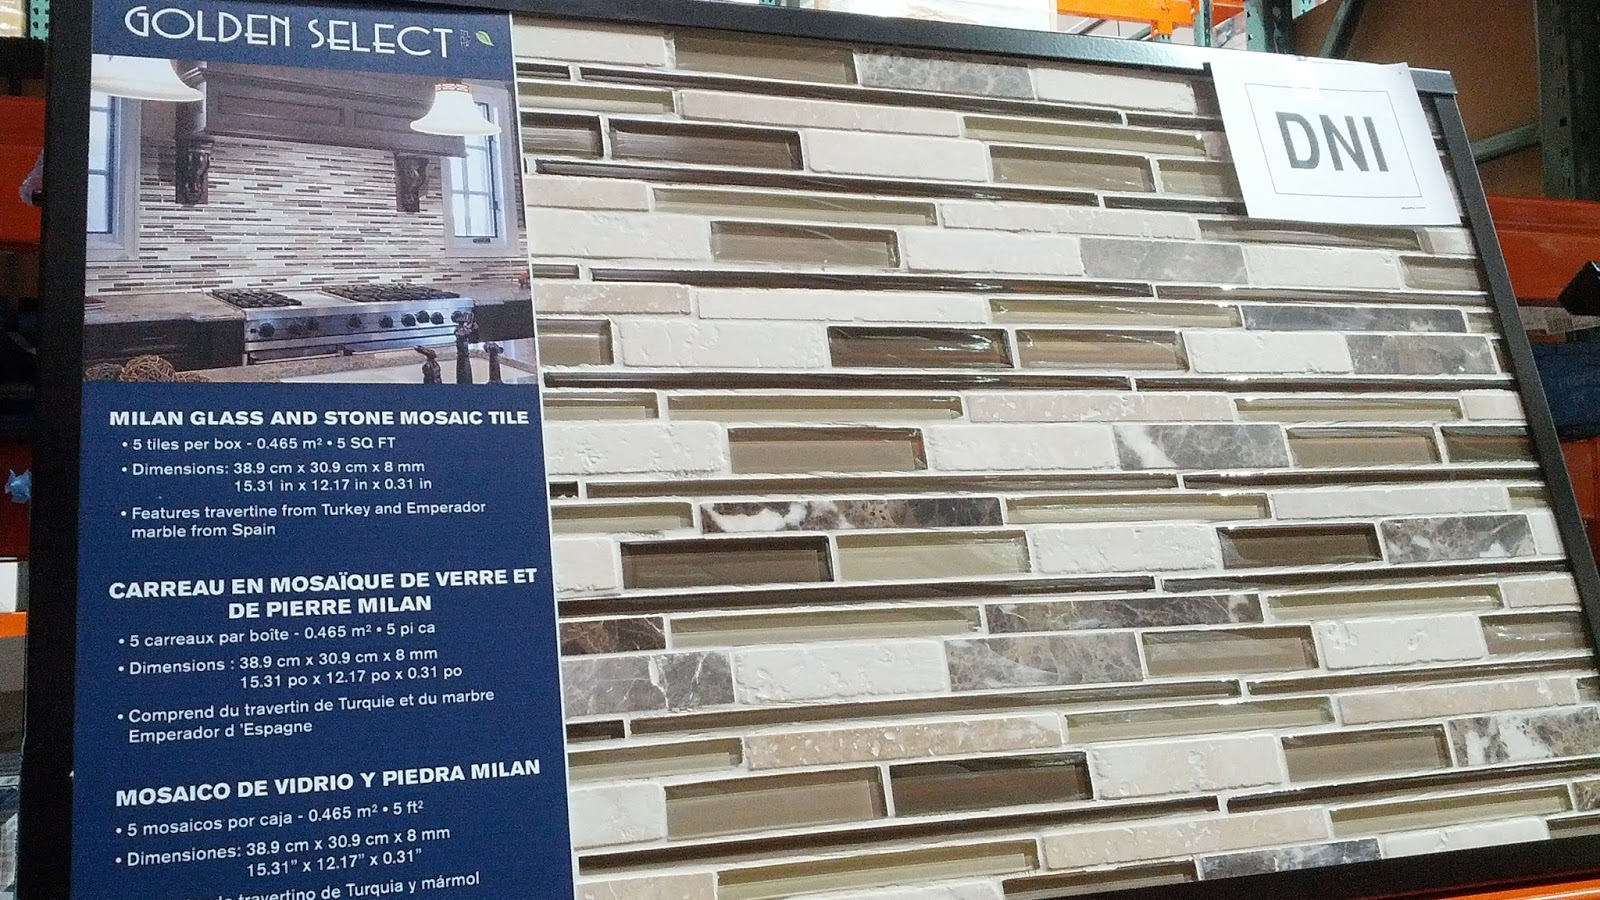 Golden Select Milan Glass Amp Stone Mosaic Wall Tiles 5 Pcs